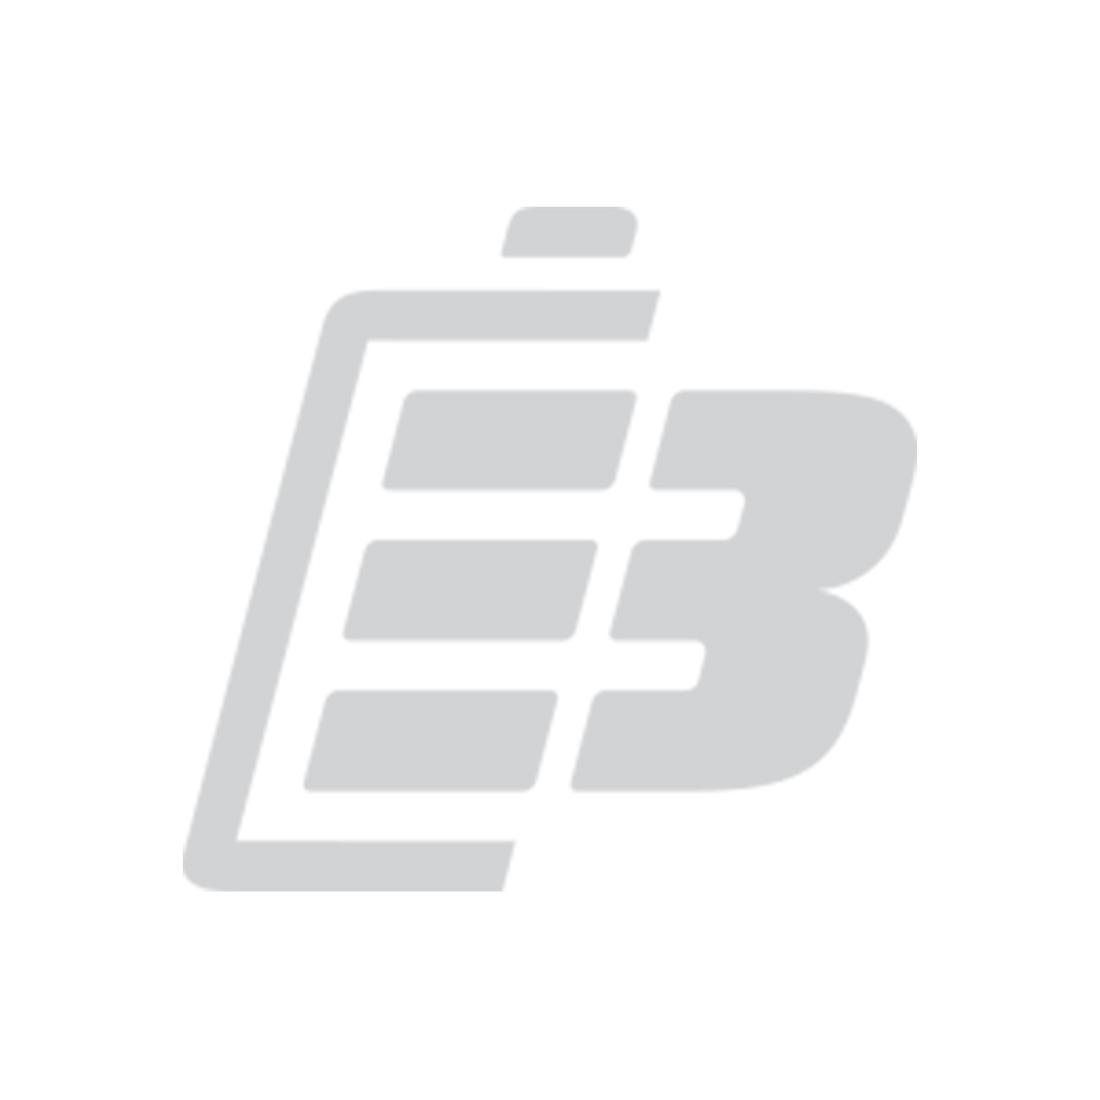 Barcode scanner battery Datalogic Falcon 4420_